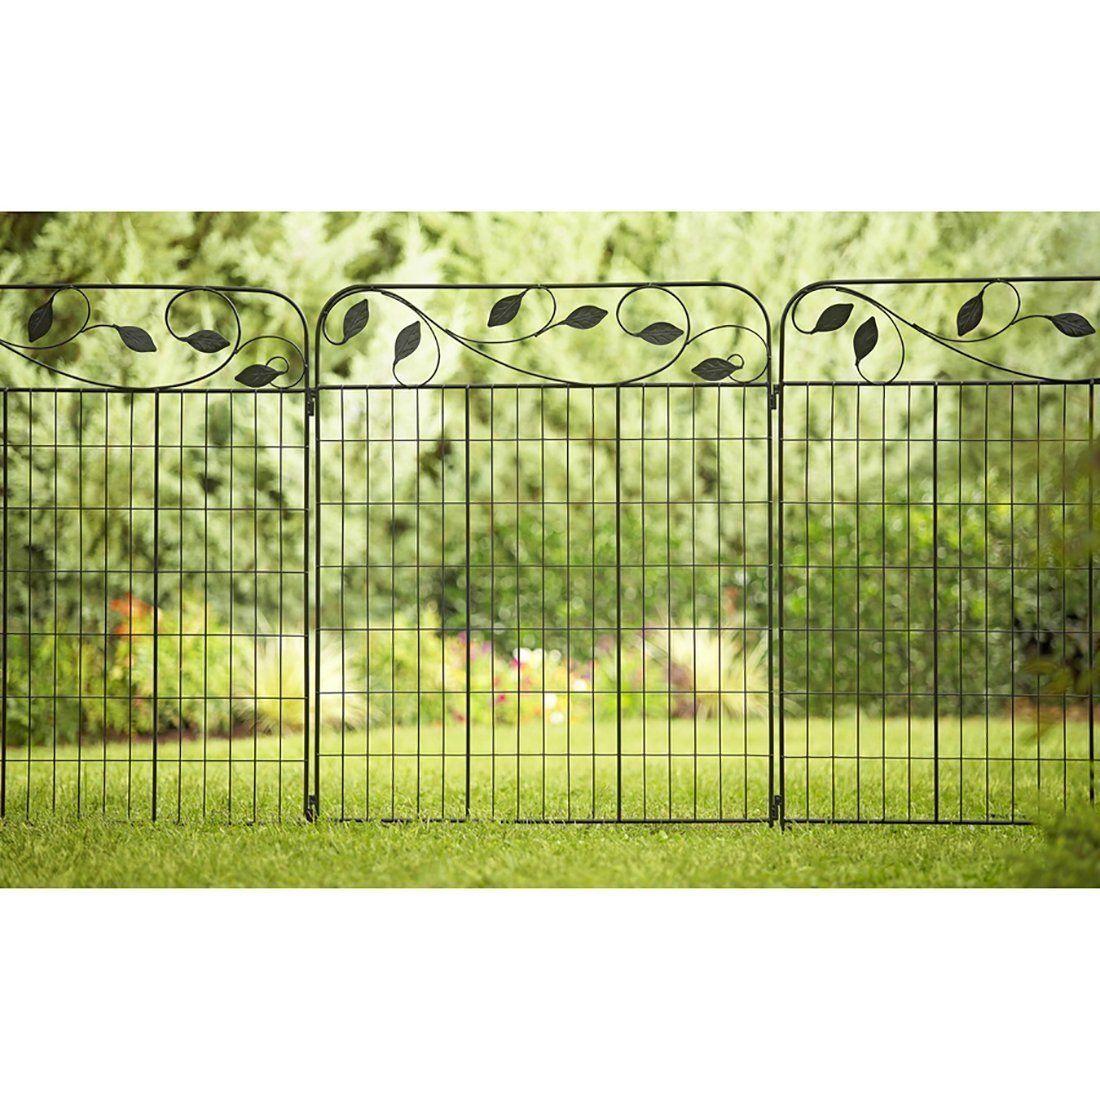 Amagabeli Decorative Garden Fence 36 X 44 X 2 Panels Metal Wire Fencing Outdoor Patio Decor Landscape Folding Black Wrought Iron Border Edging Section Flower B Decorative Garden Fencing Patio Fence Metal Garden Fencing